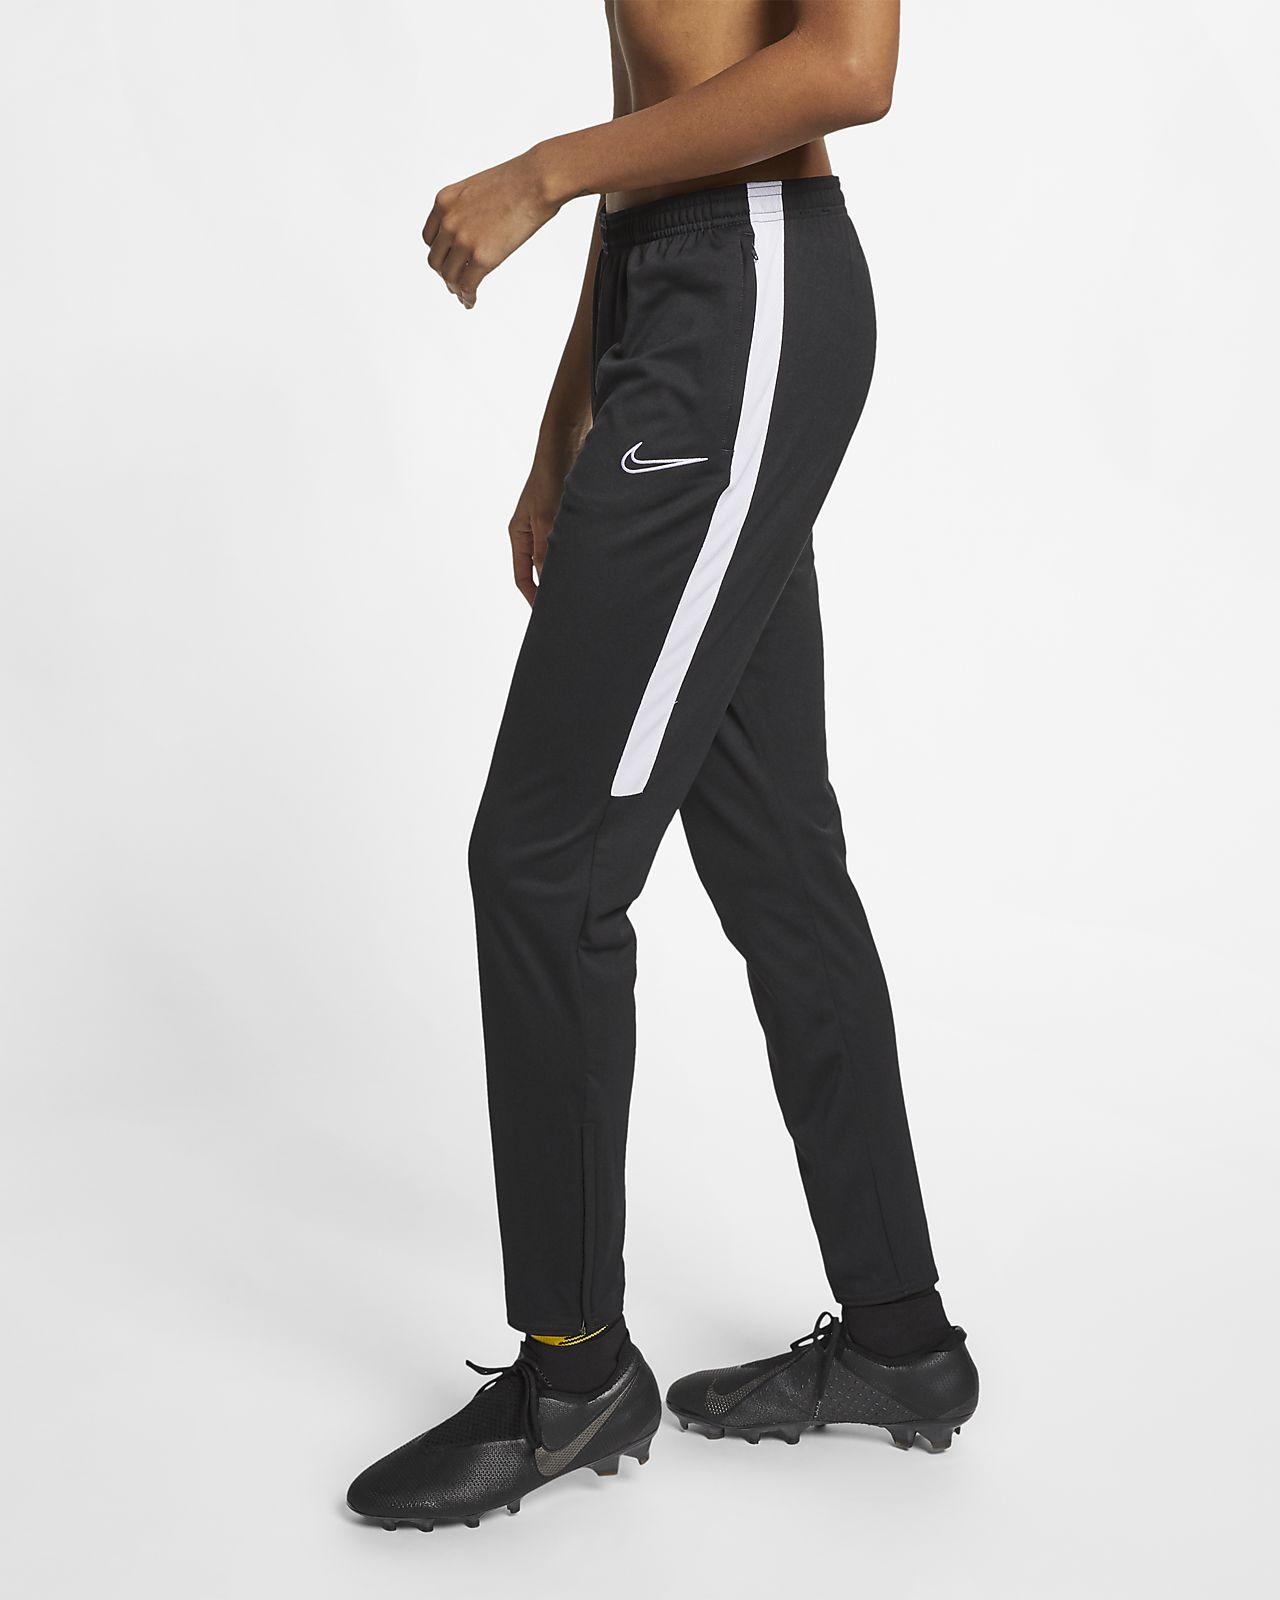 online retailer 20913 1b653 ... Pantaloni da calcio Nike Dri-FIT Academy - Donna